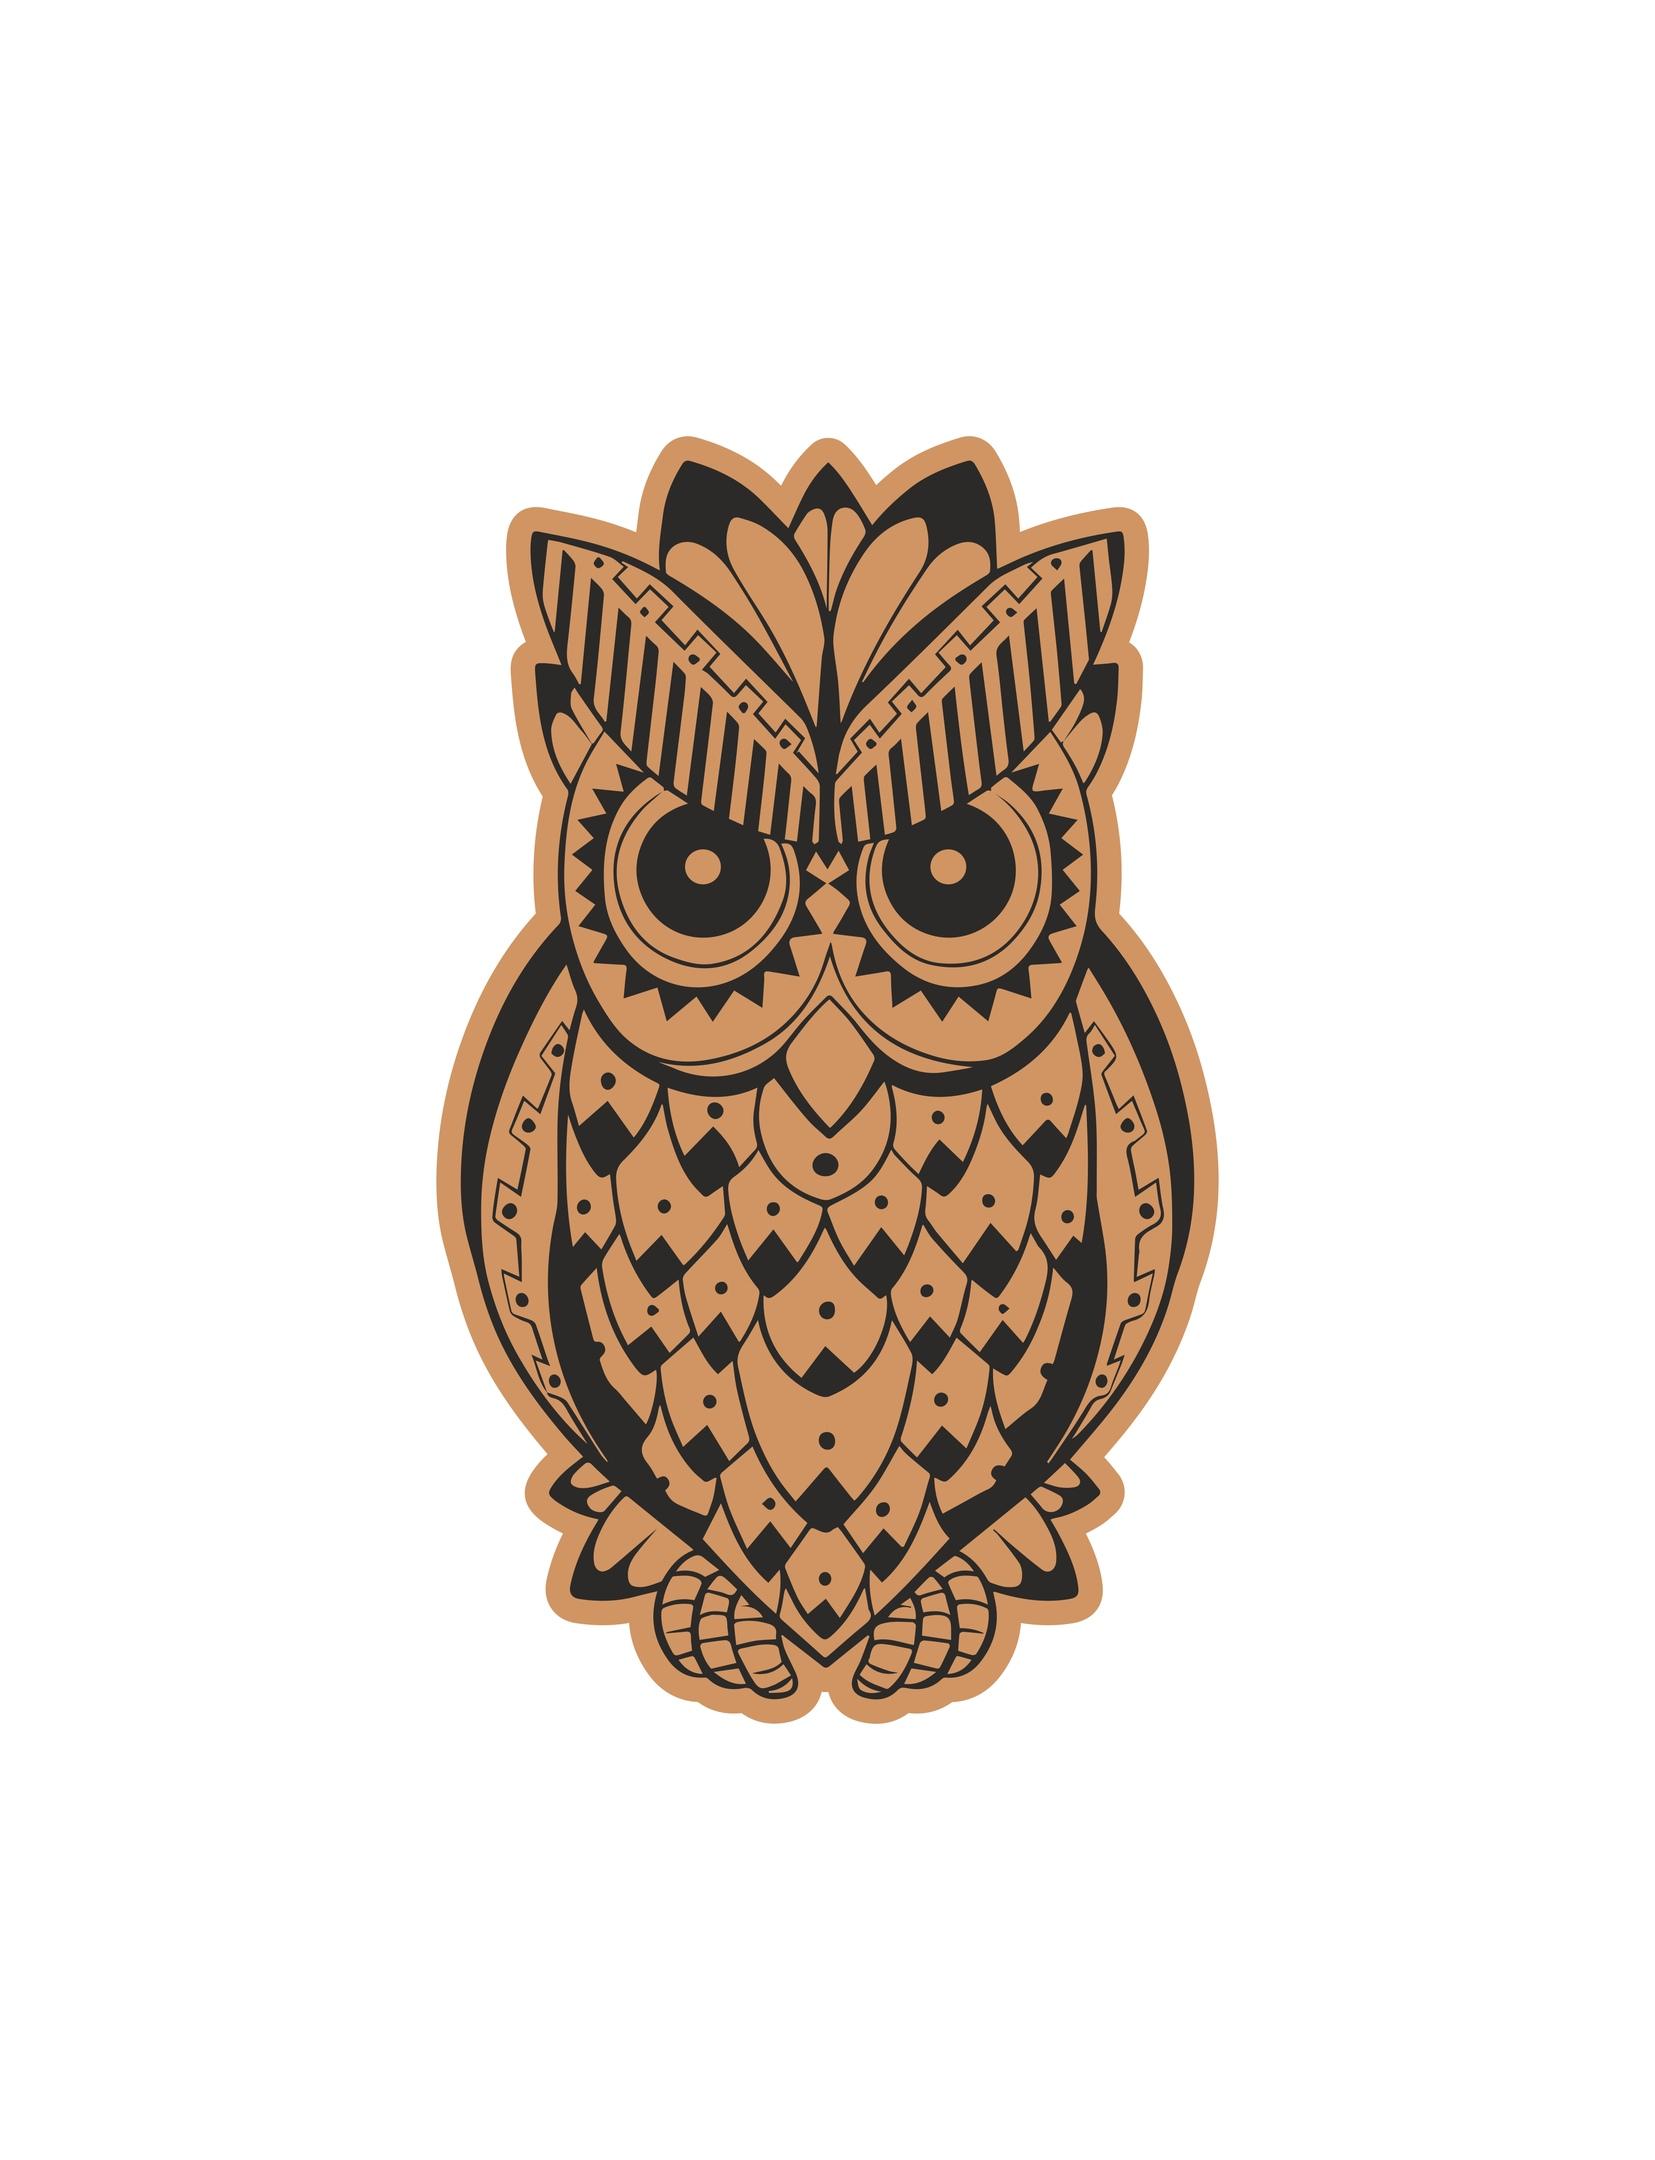 Decorative Cute Owl Laser Cut Engraving Template Free Vector